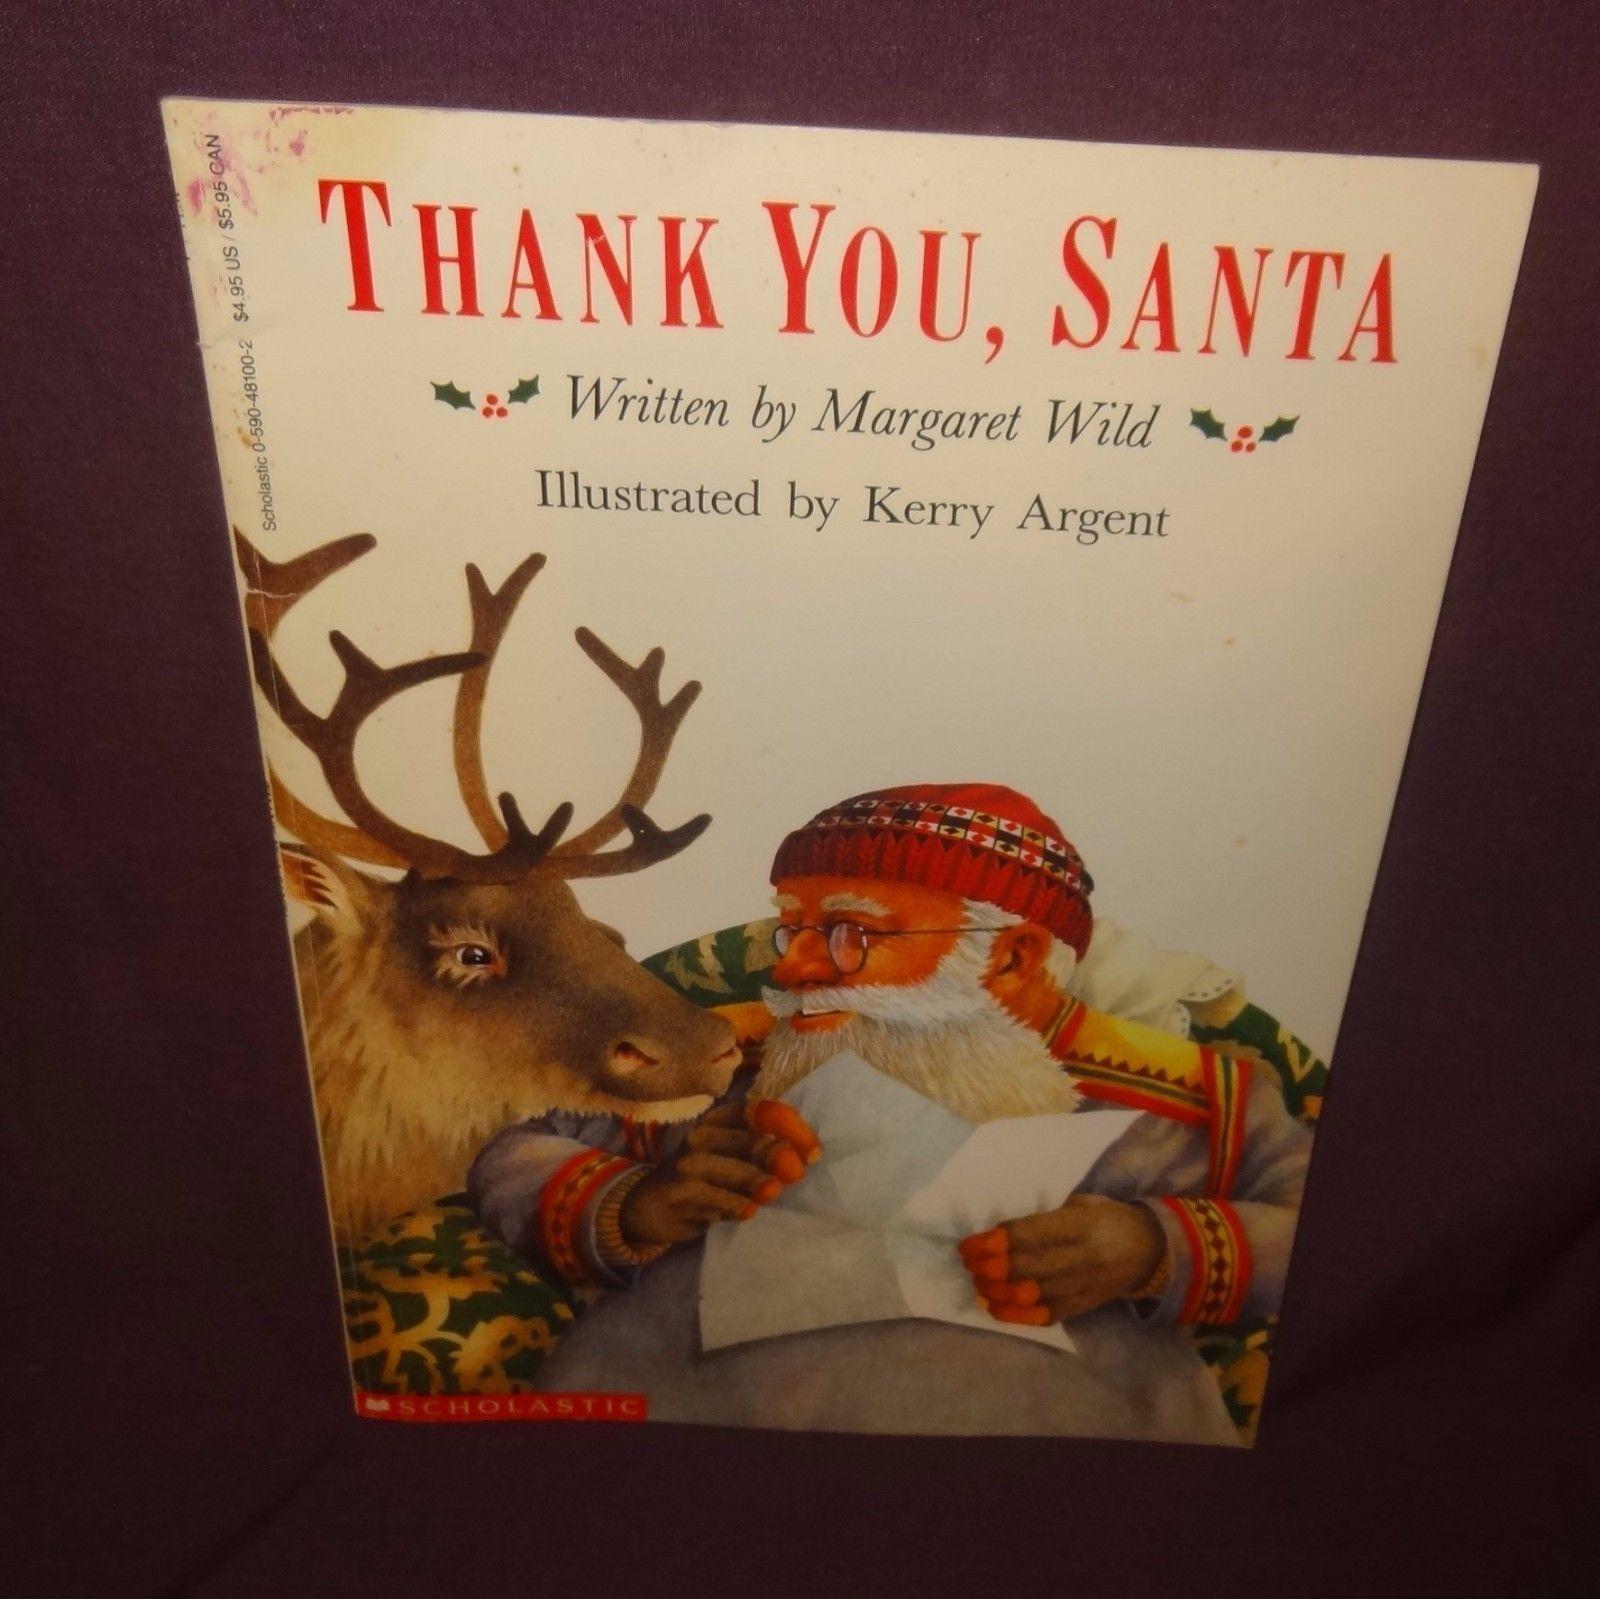 Thank You Santa Paperback Book Childrens 1991 Christmas Scholastic Margaret Wild